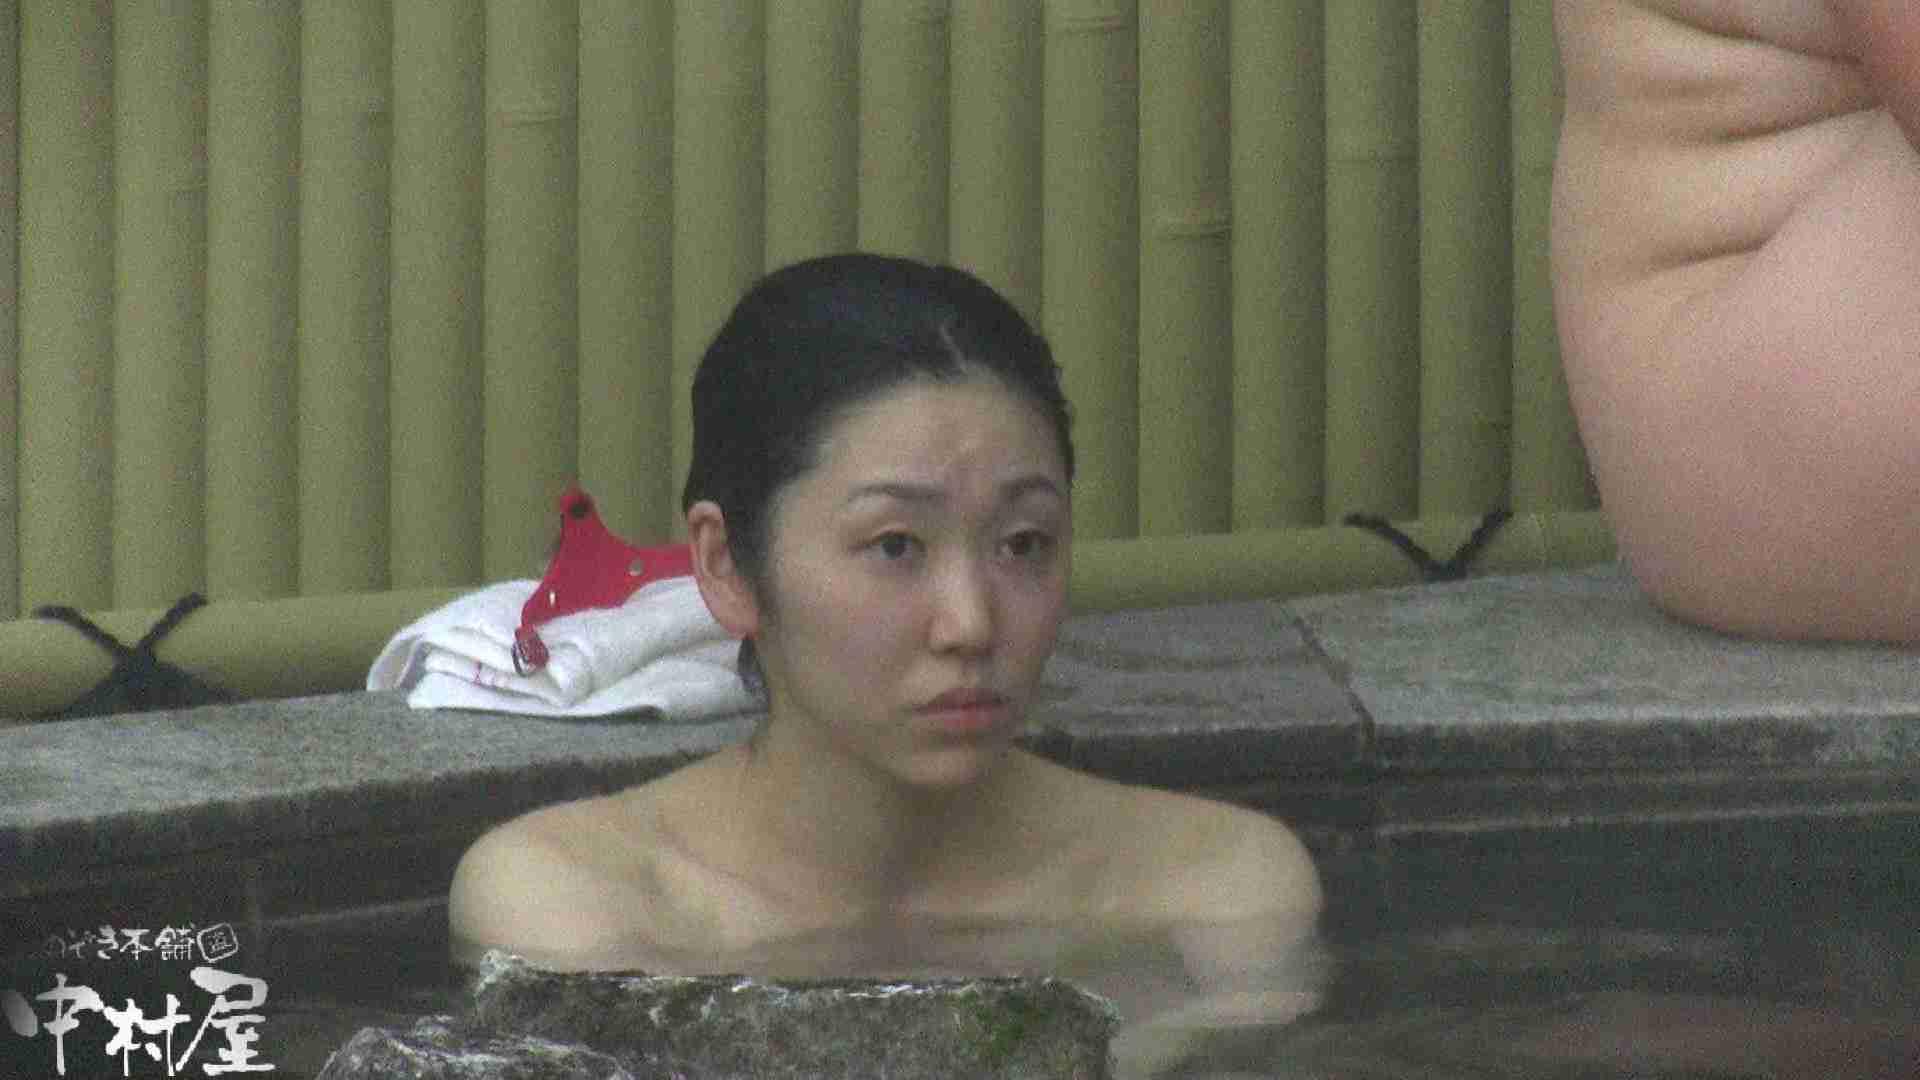 Aquaな露天風呂Vol.917 OLセックス  102画像 39